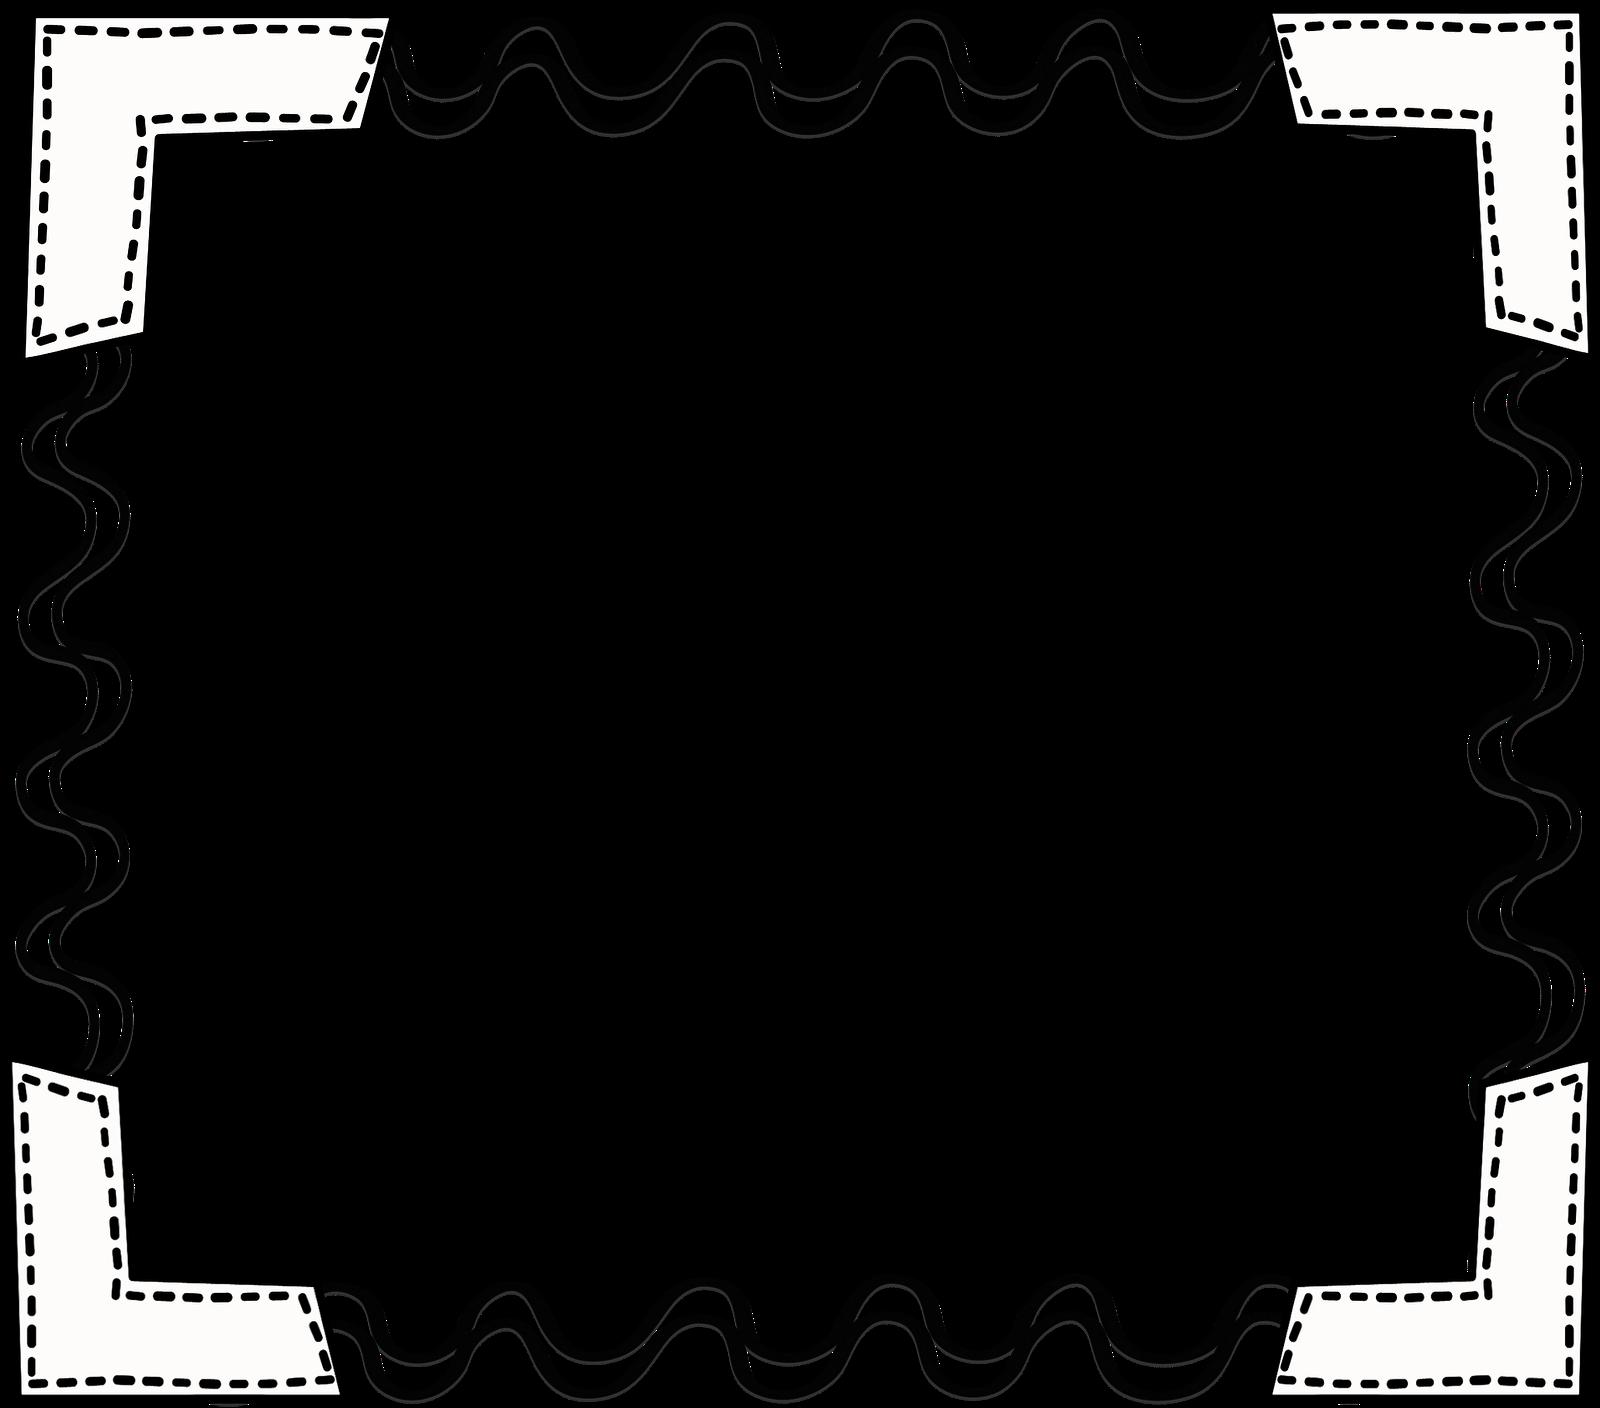 Bprder clipart clip art stock School border clipart black and white 5 - WikiClipArt clip art stock